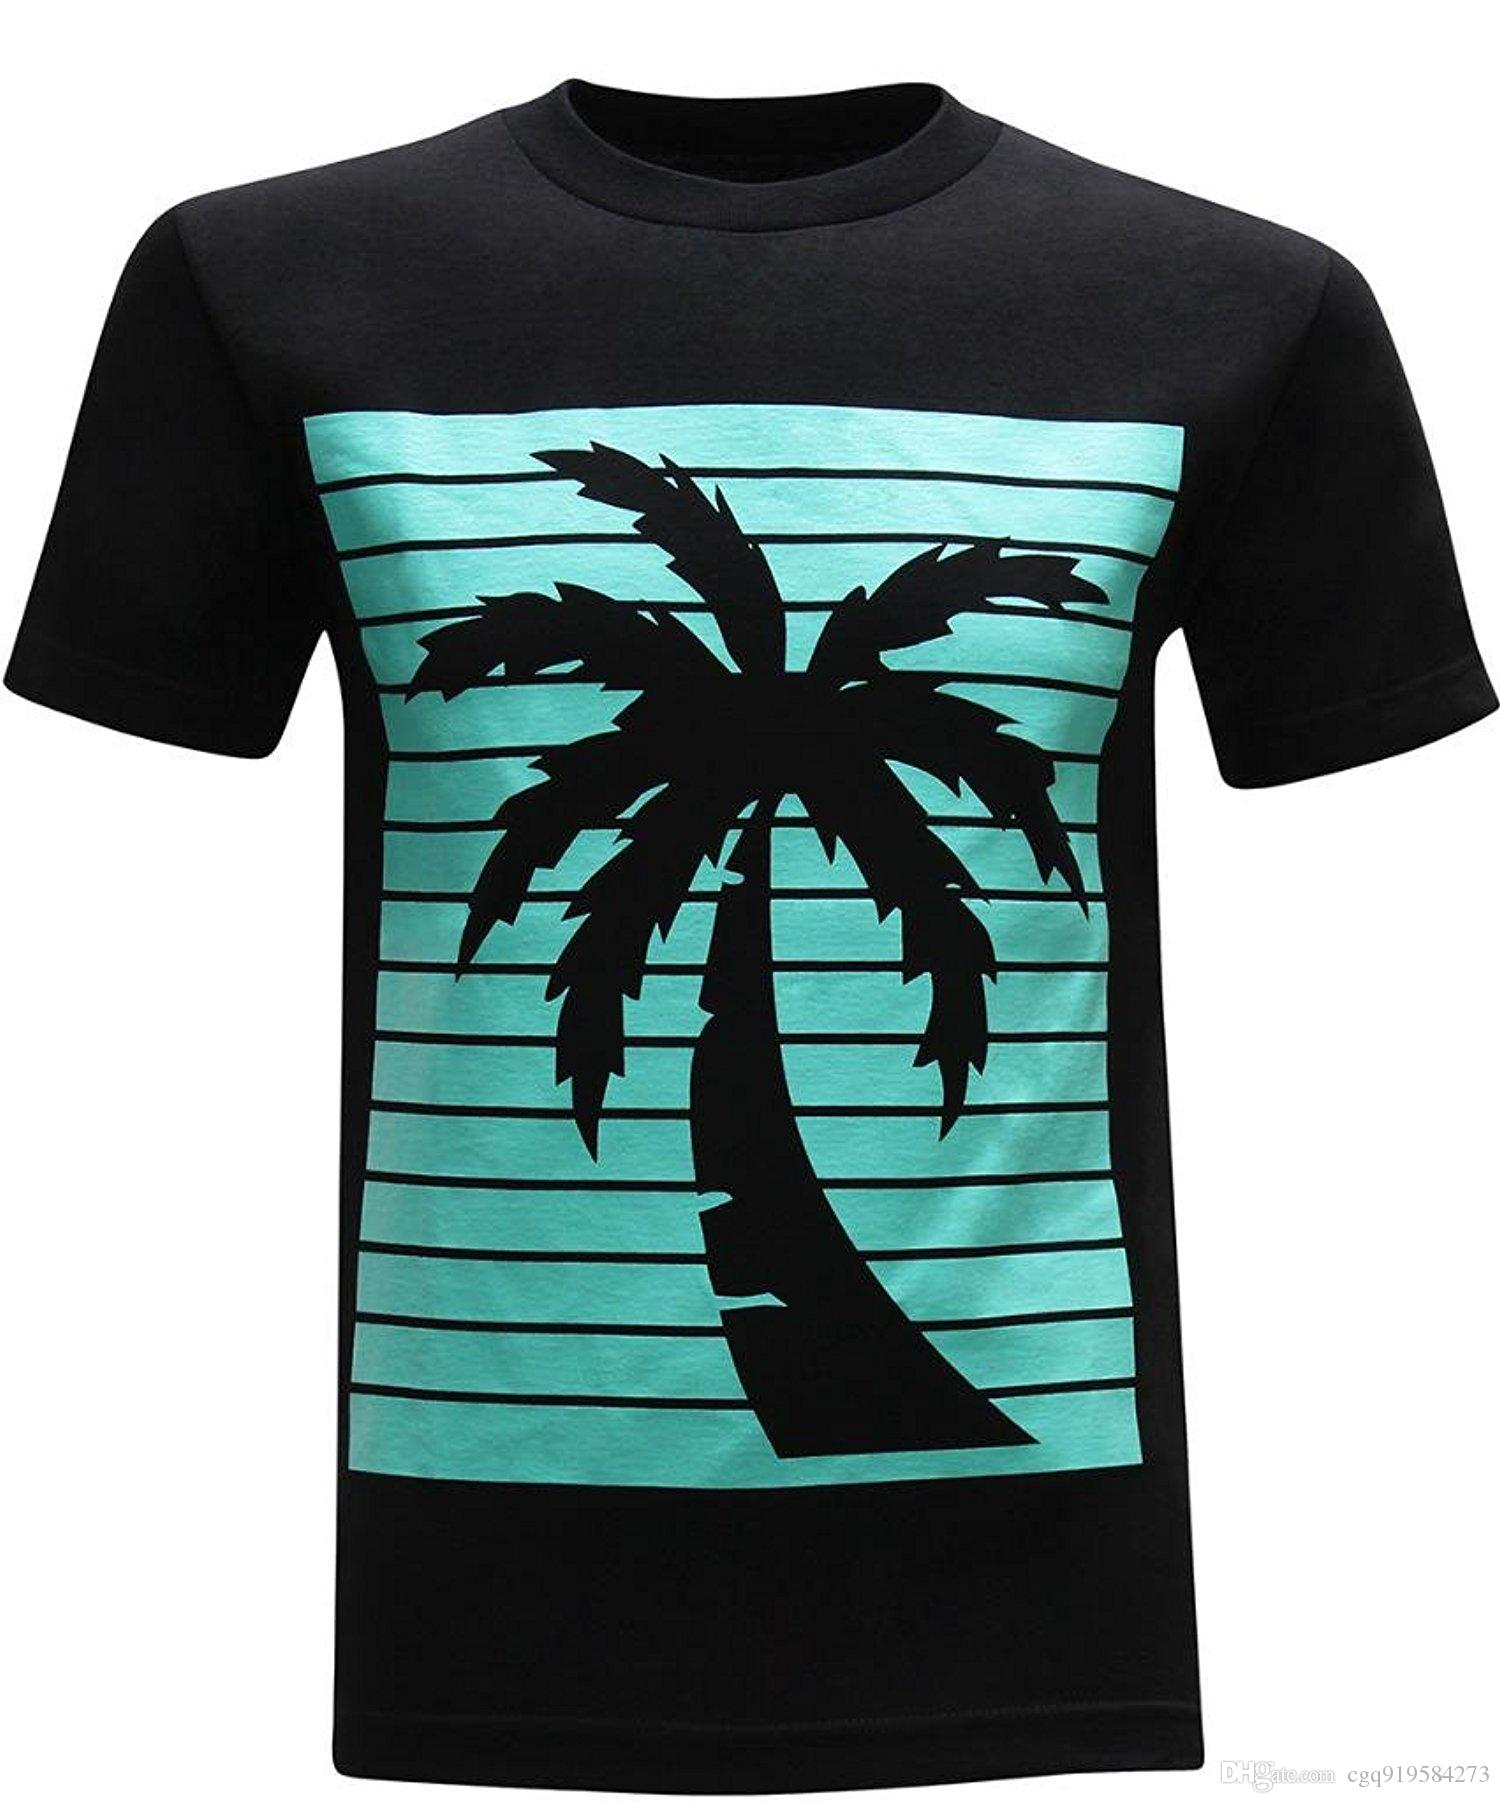 Black t shirt diy - See Larger Image